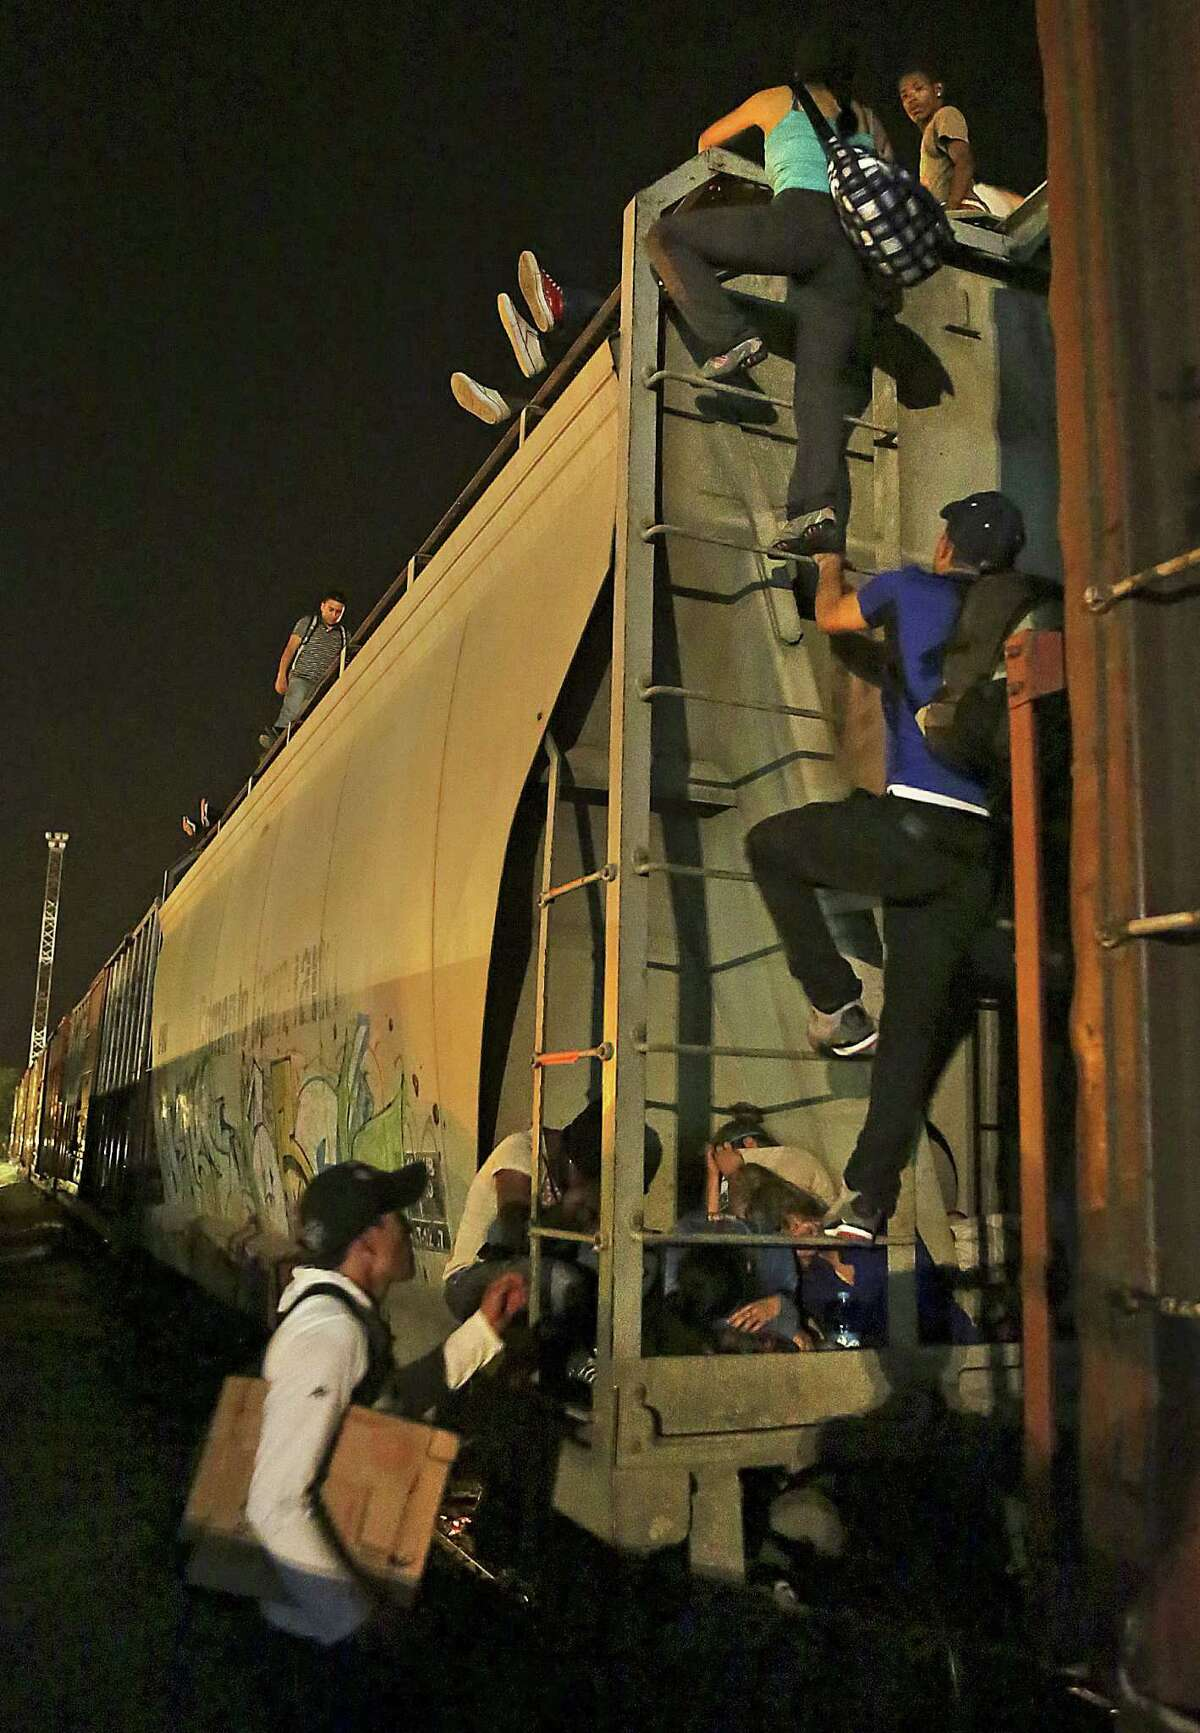 Migrants seeking a better life in the U.S. board the train known as La Bestia, The Beast, in Arriaga, Mexico.